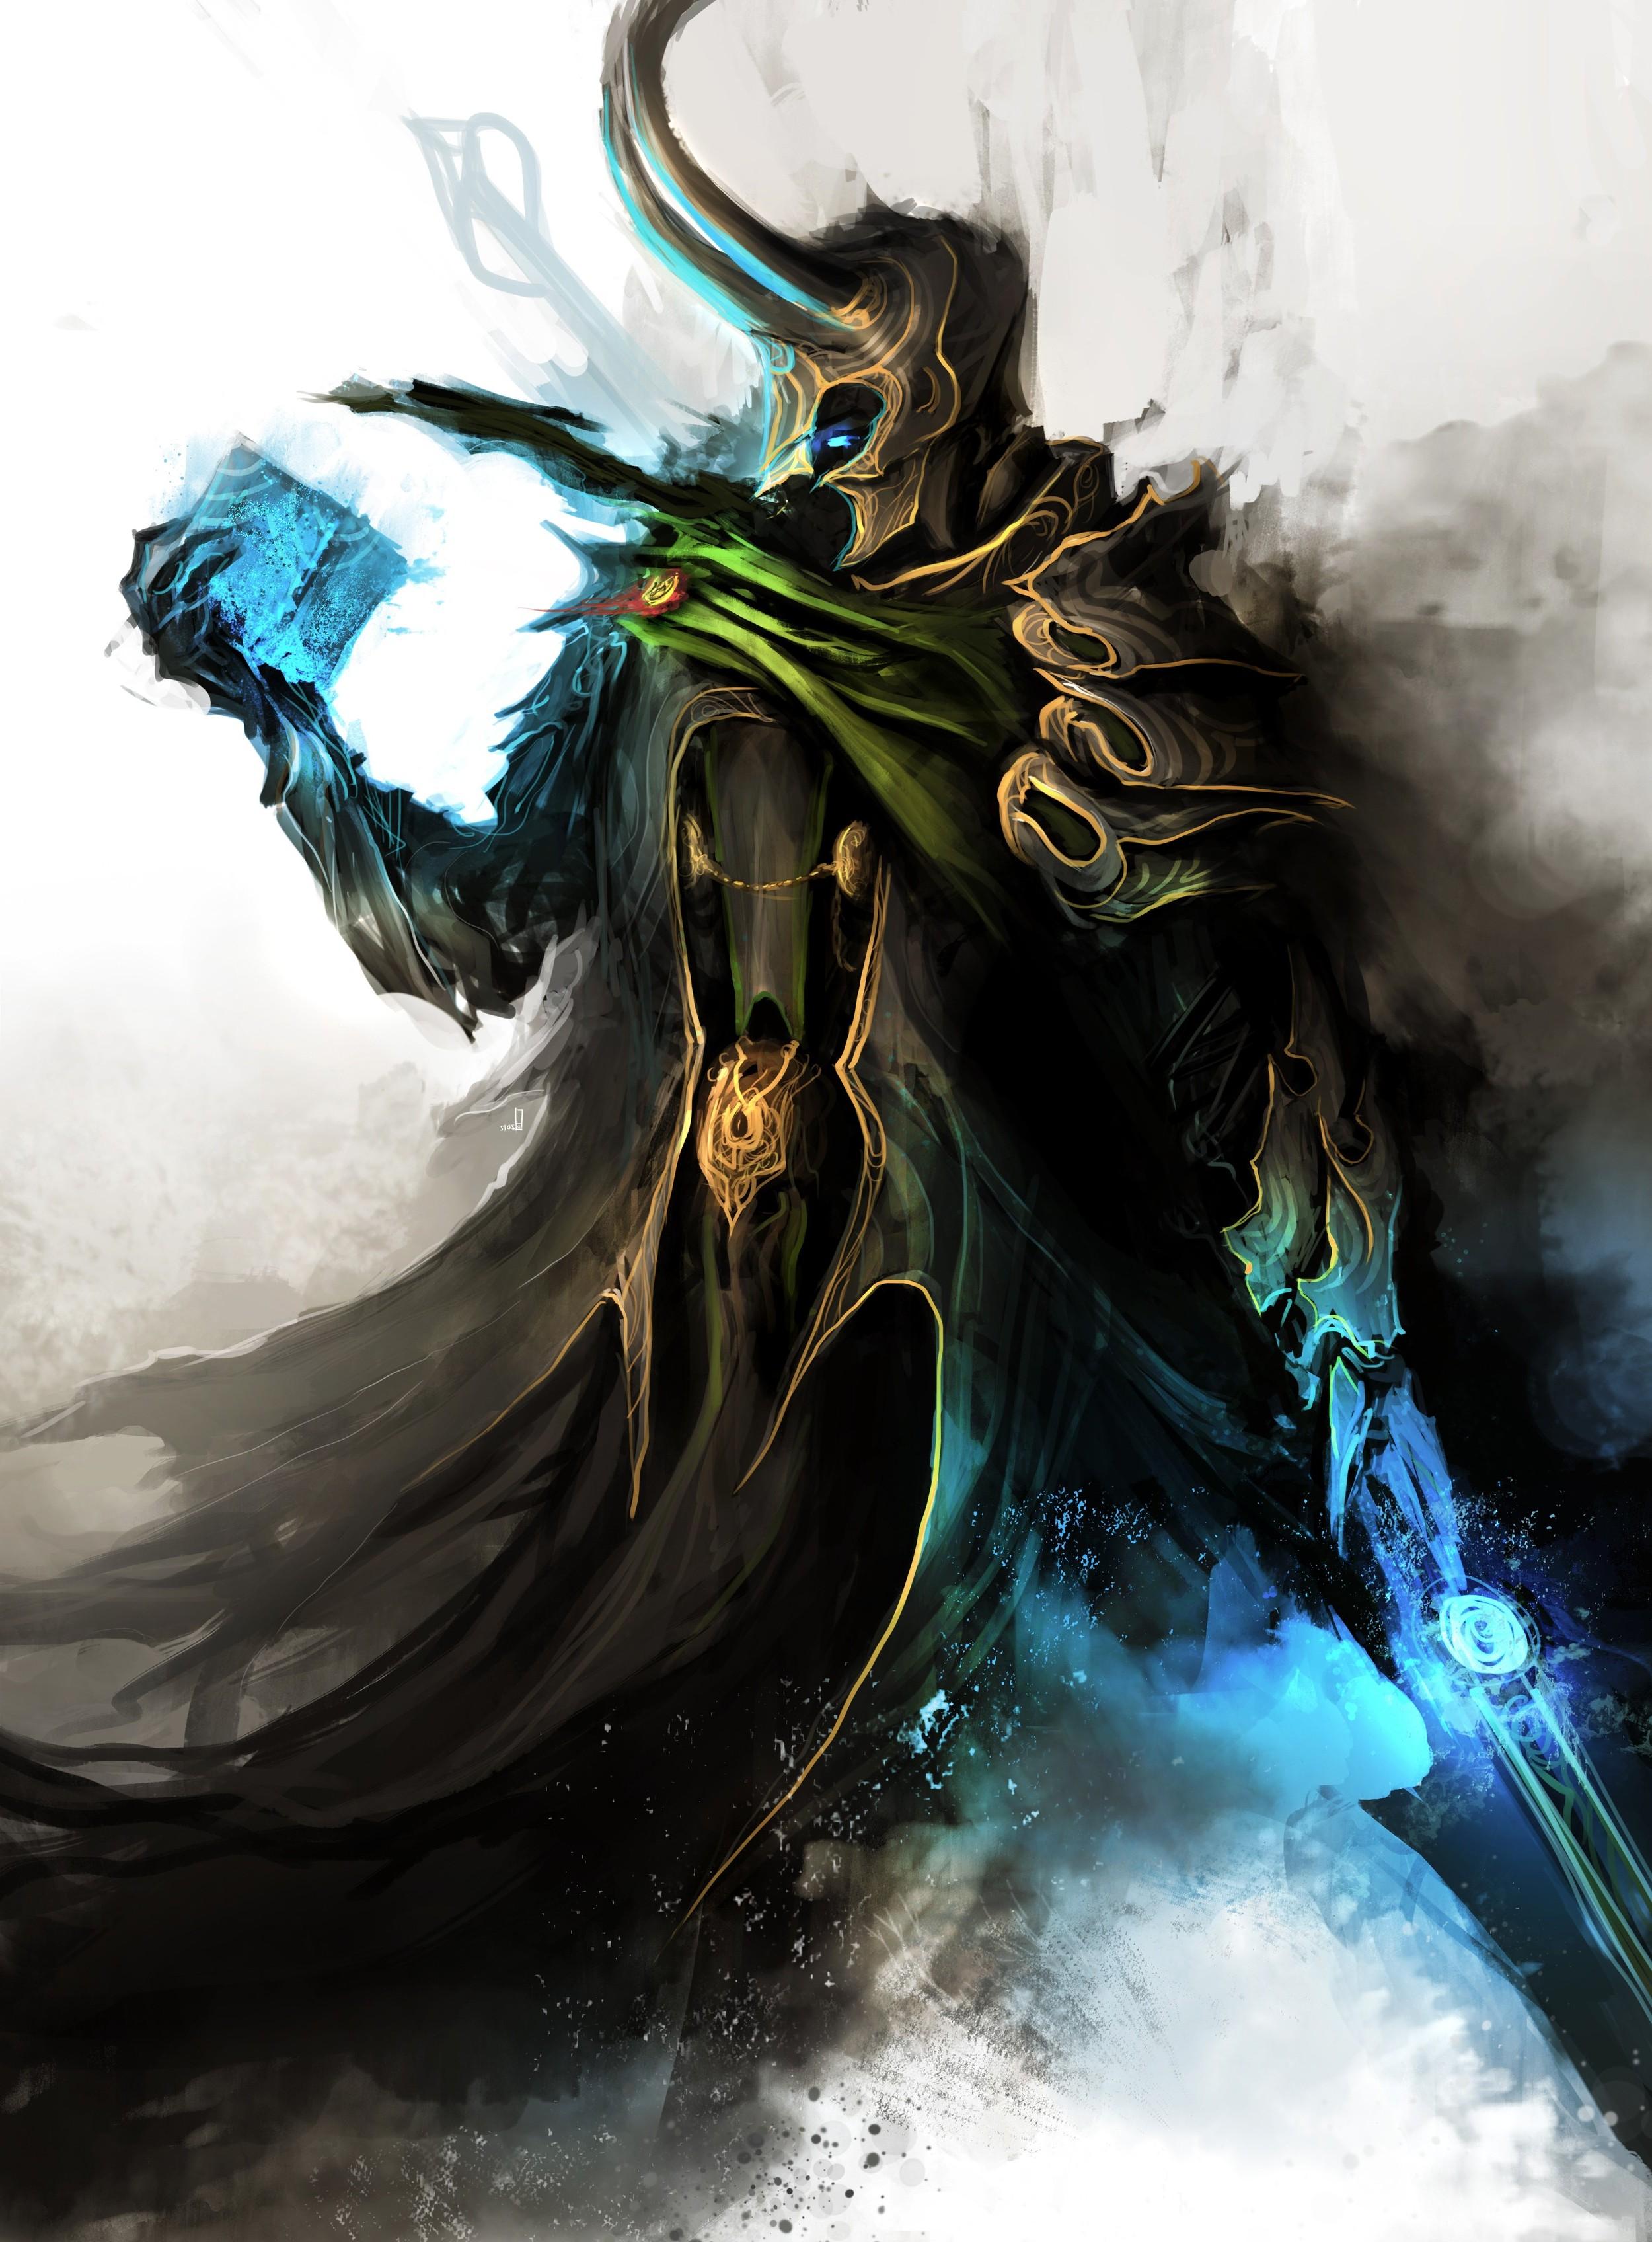 Desktop Backgrounds Marvel Loki - HD Wallpaper